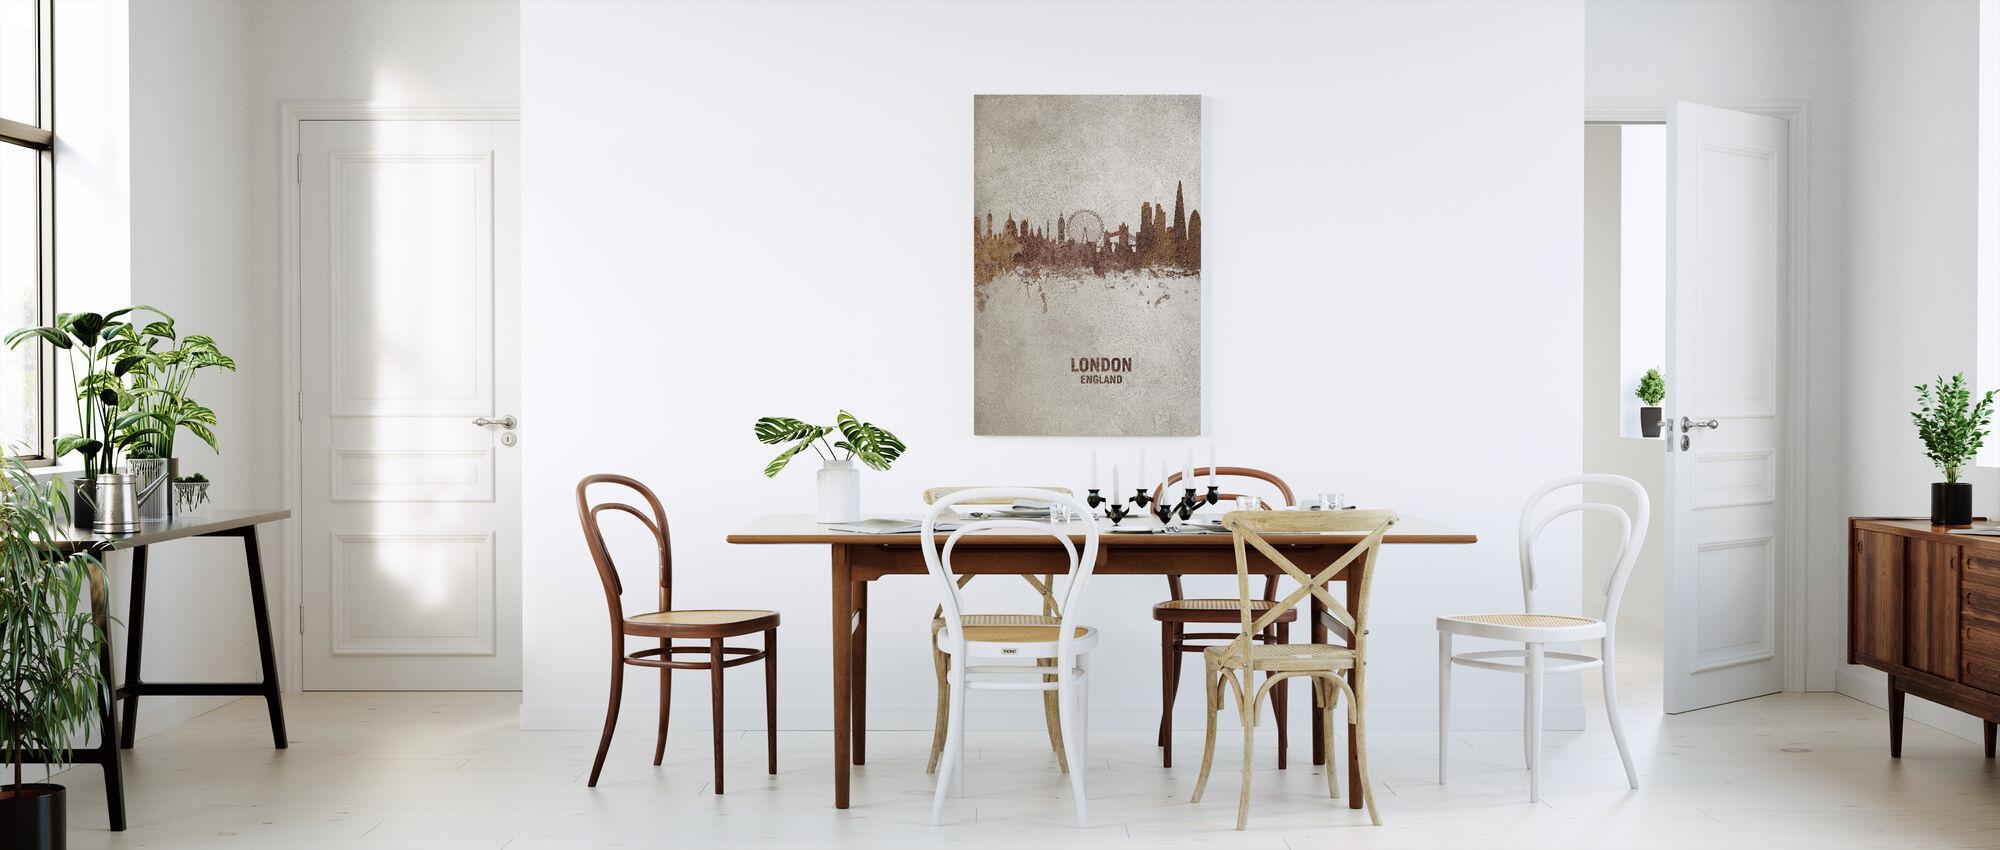 London England Rust Skyline - Canvas print - Kitchen